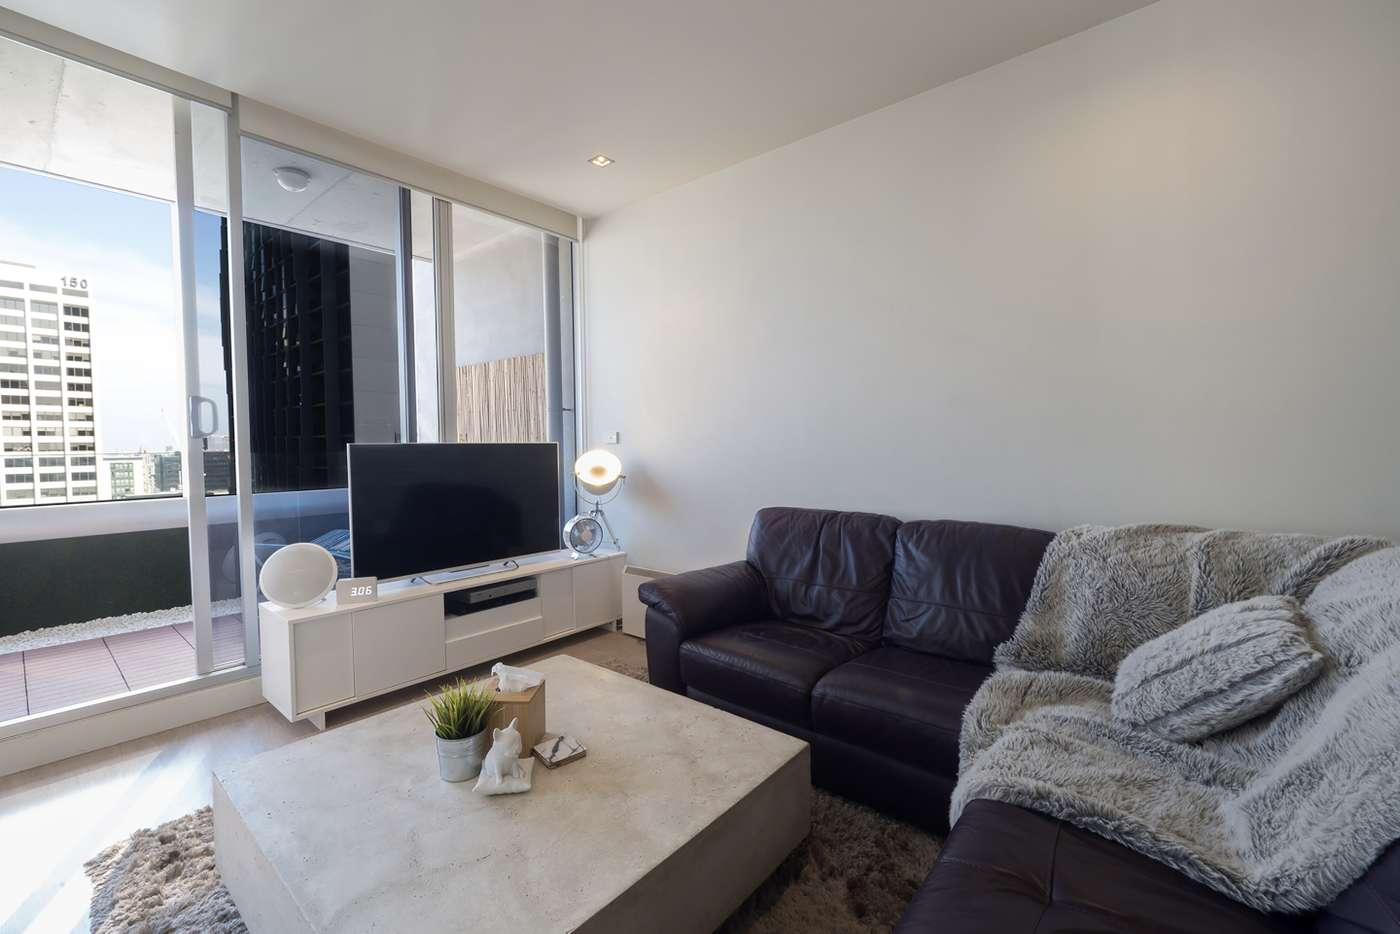 Main view of Homely apartment listing, Unit 1610/68 La Trobe St, Melbourne VIC 3000